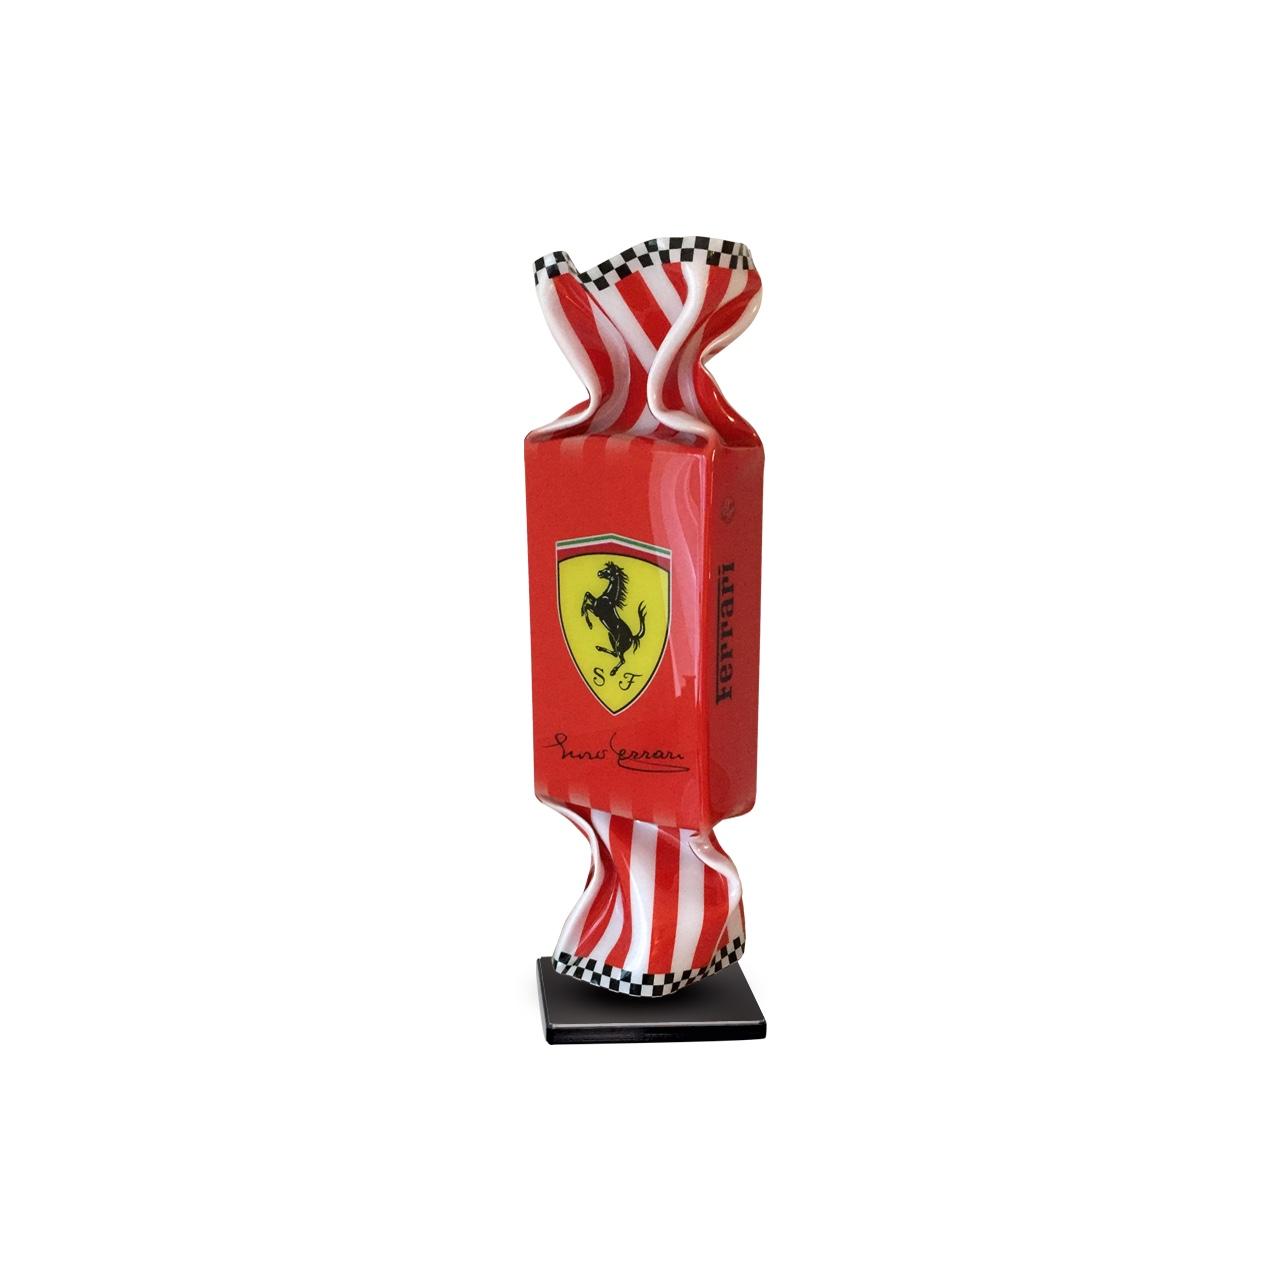 Michael-Daniels-Art-Toffee-Ferrari